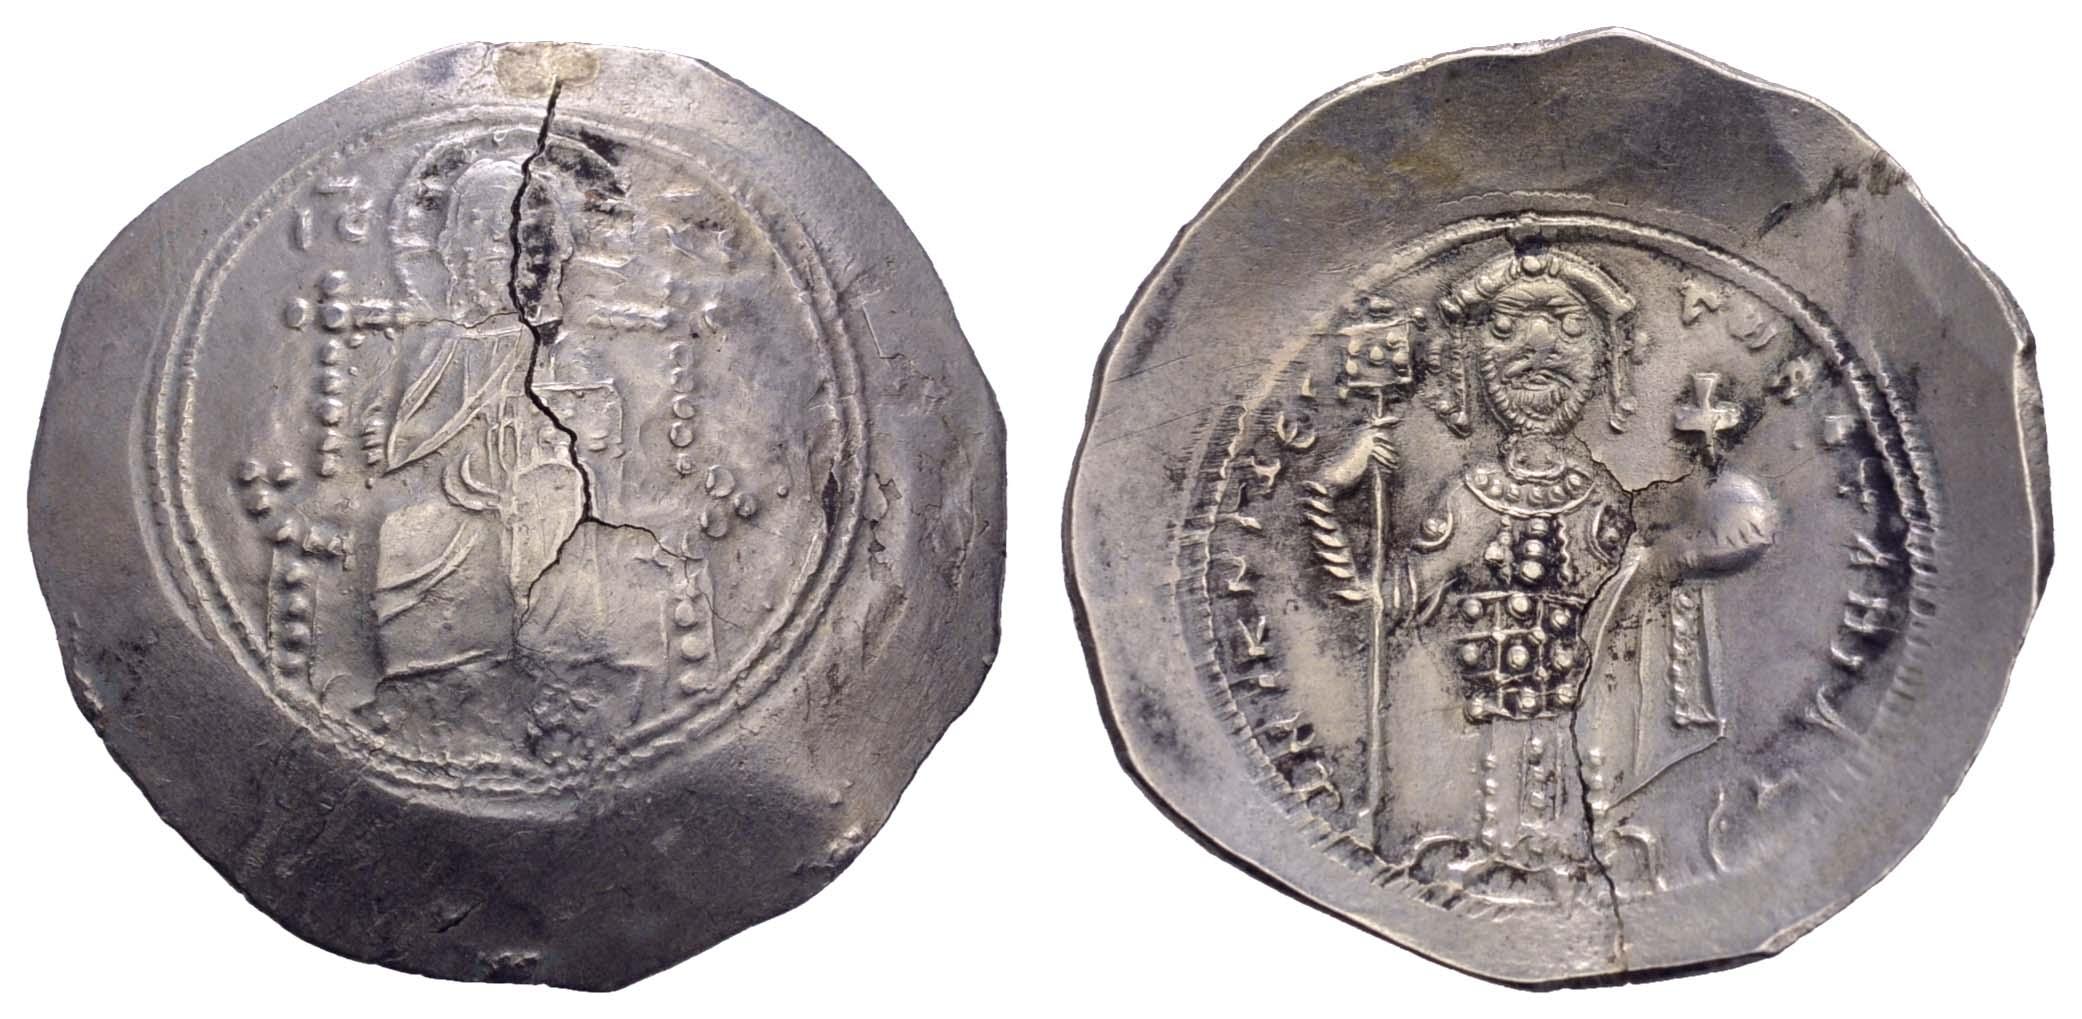 Lot 373 - Antike Byzanz -  Auktionshaus Ulrich Felzmann GmbH & Co. KG Coins single lots